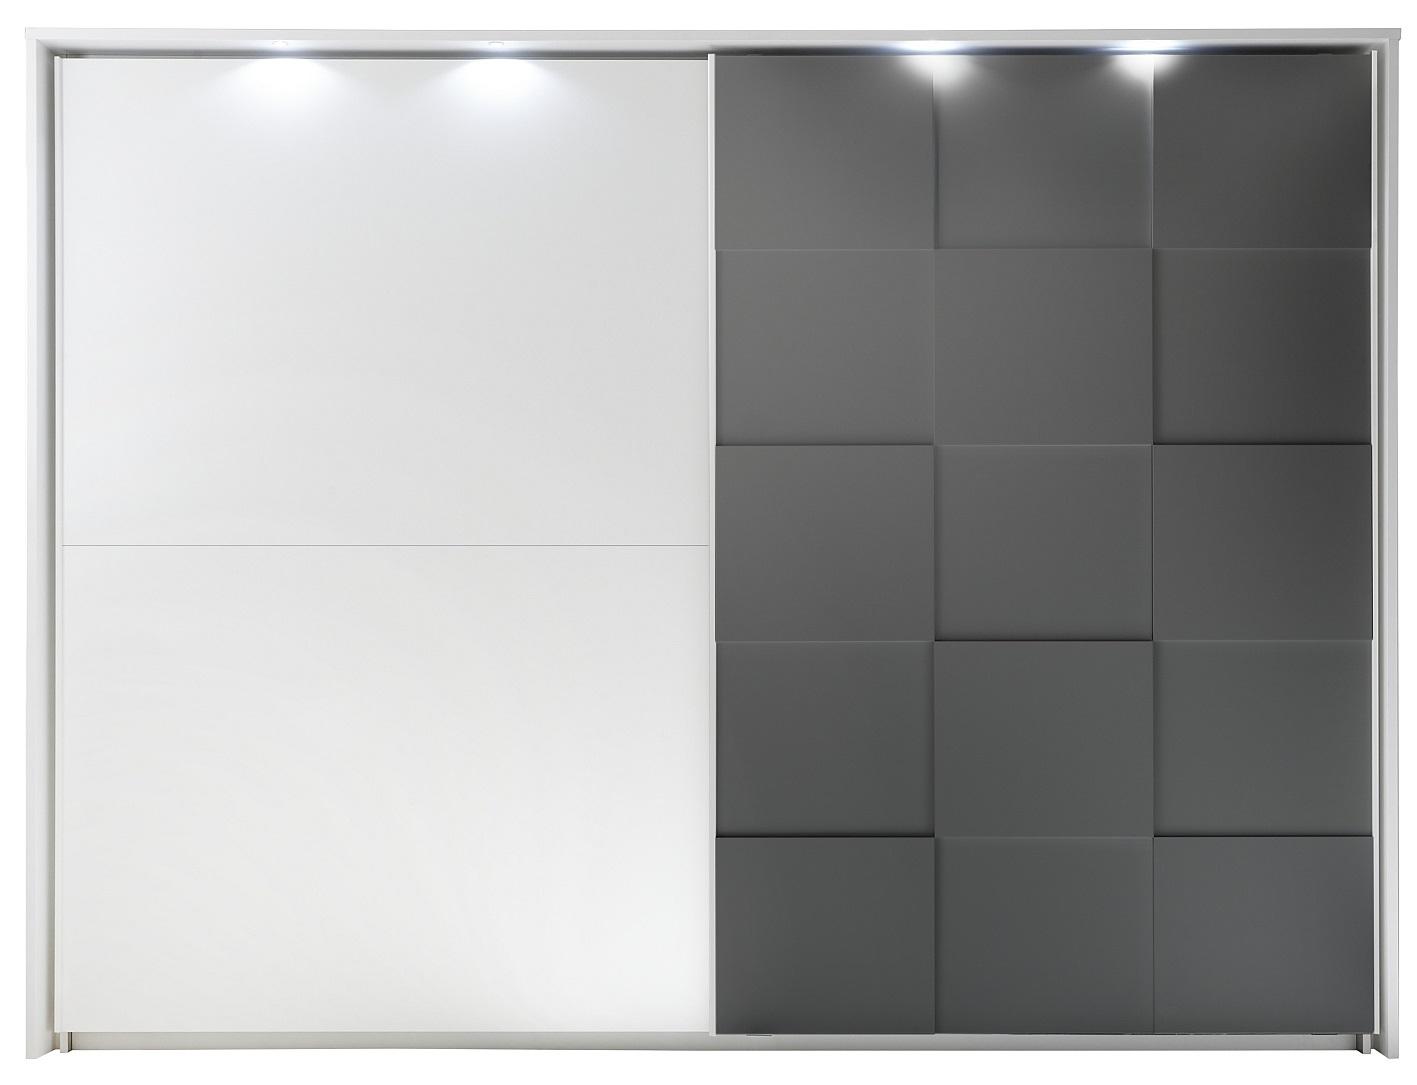 Kledingkast Ottica 275 cm breed in mat wit met mat grijs   Pesaro Mobilia